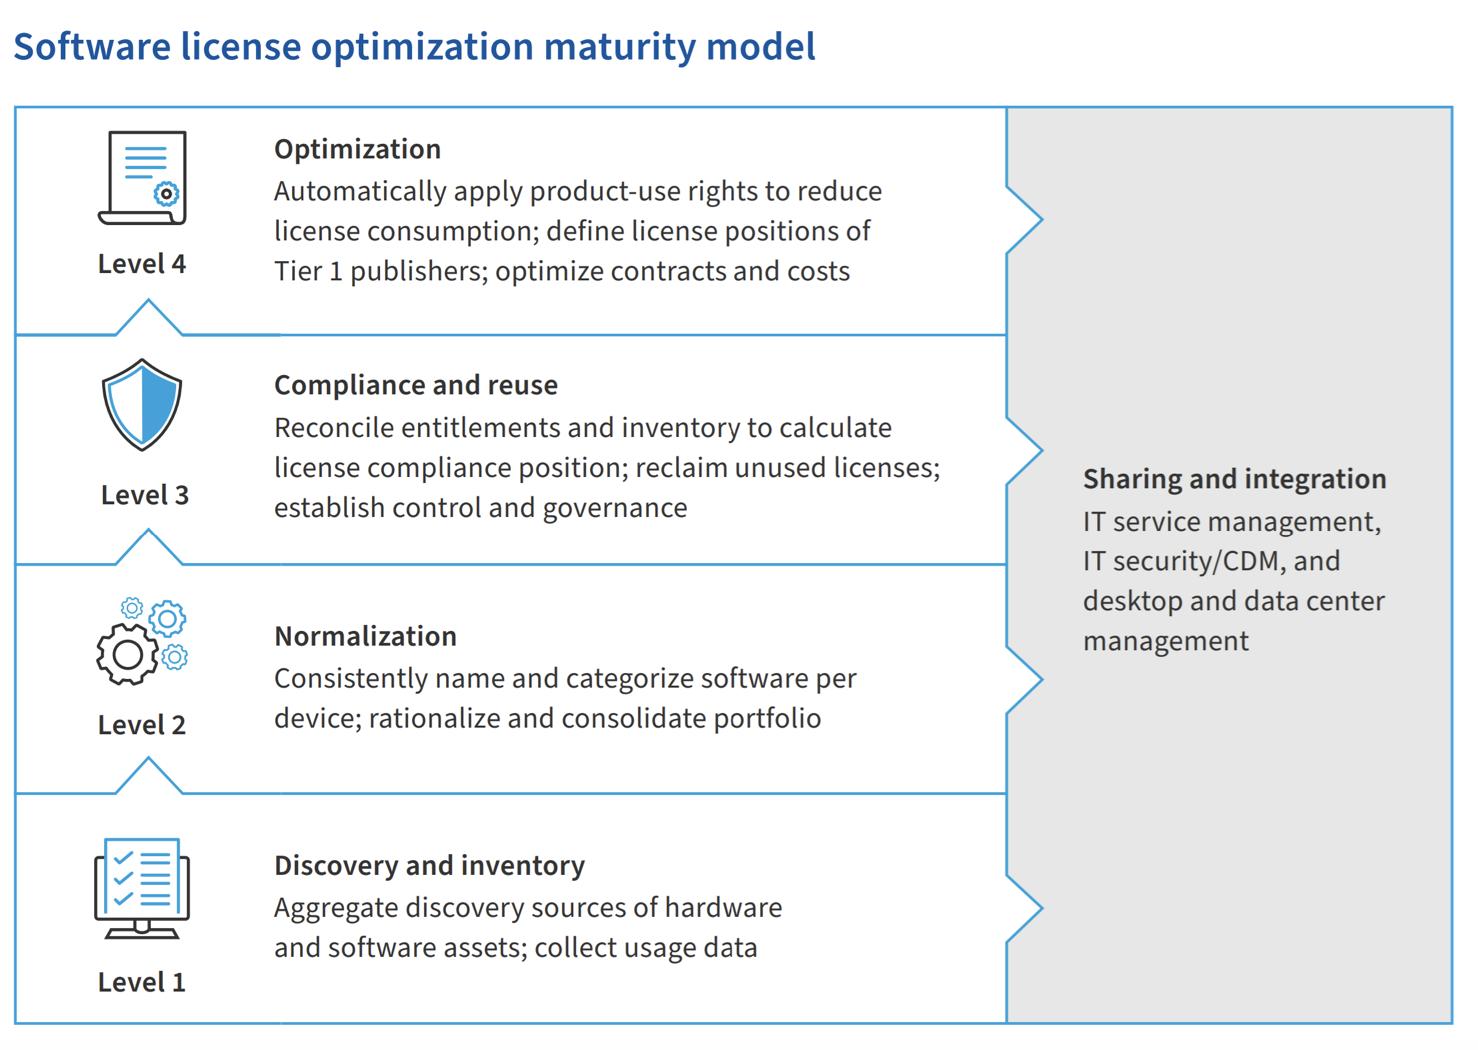 Software license optimization maturity model